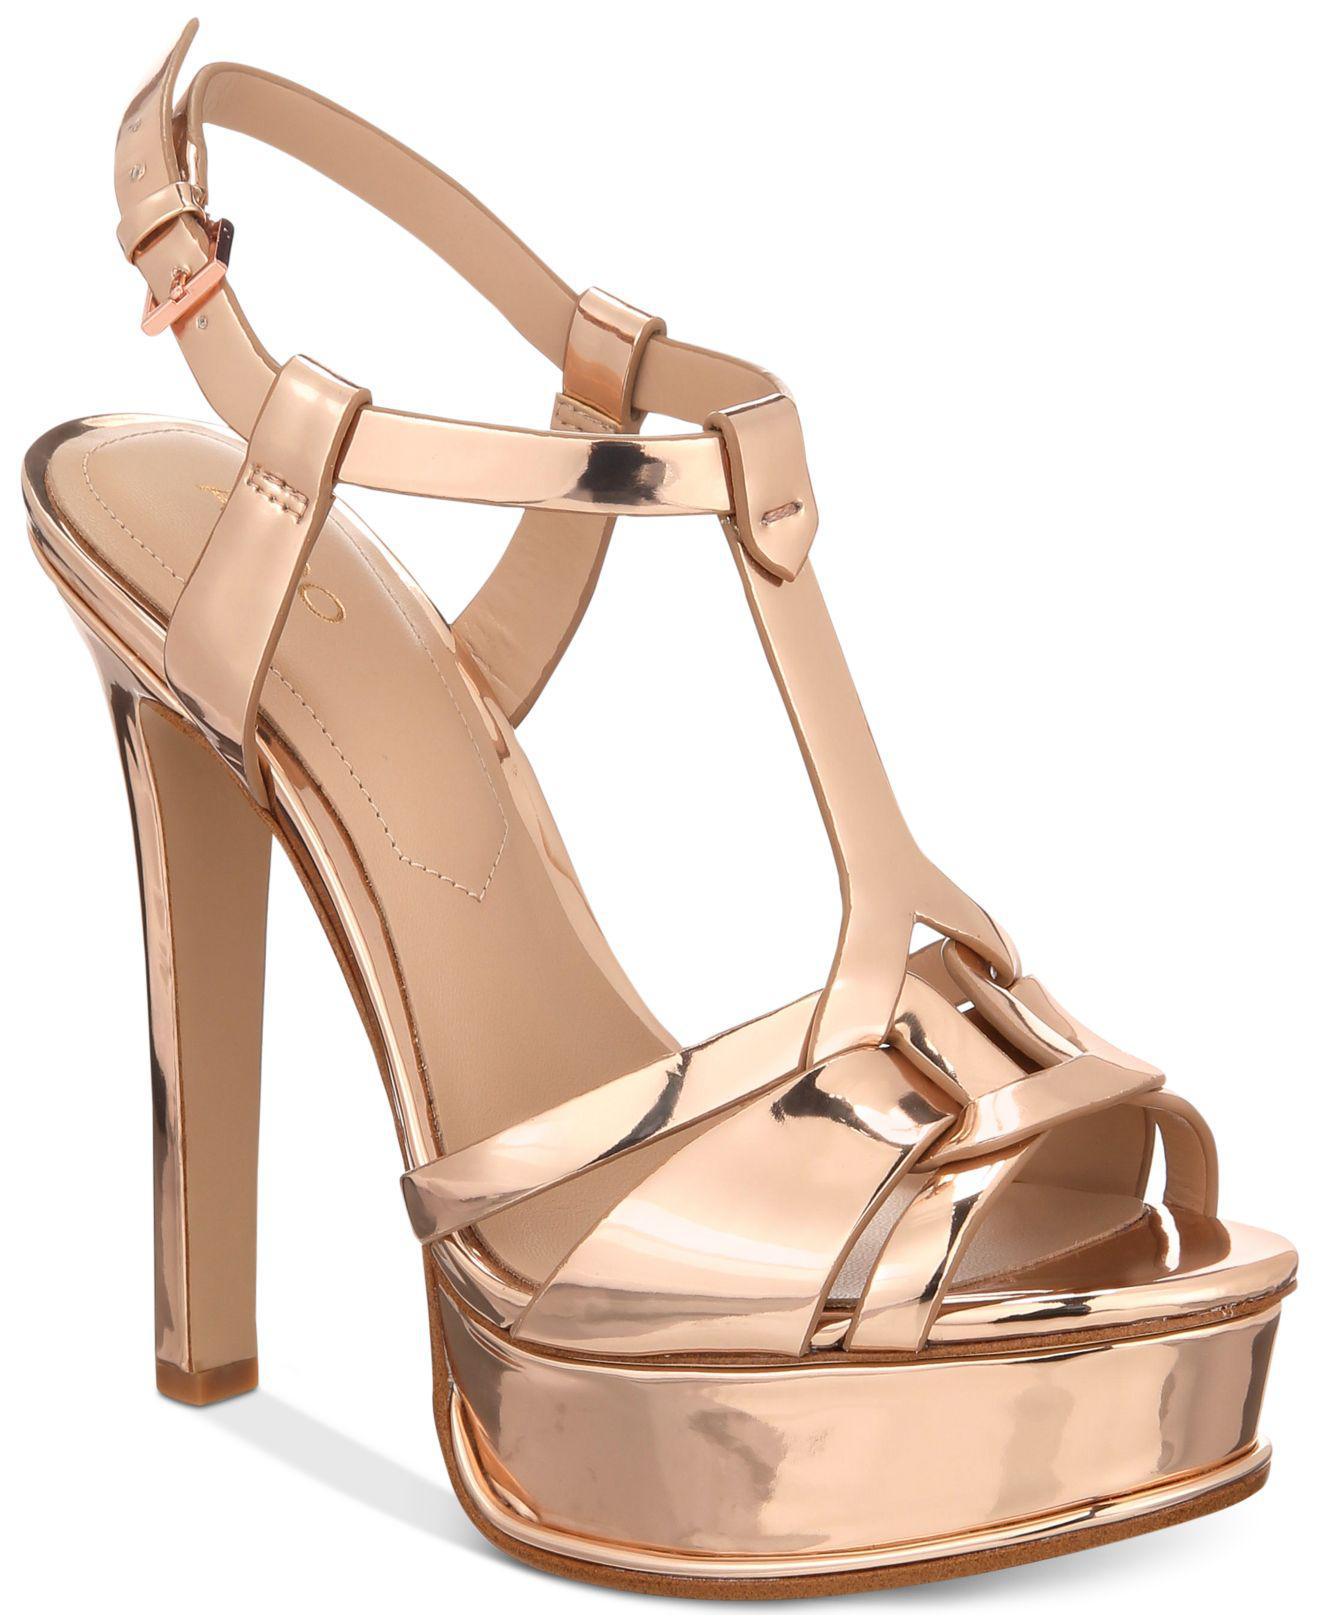 aa28aabe75d Lyst - ALDO Chelly Platform Dress Sandals